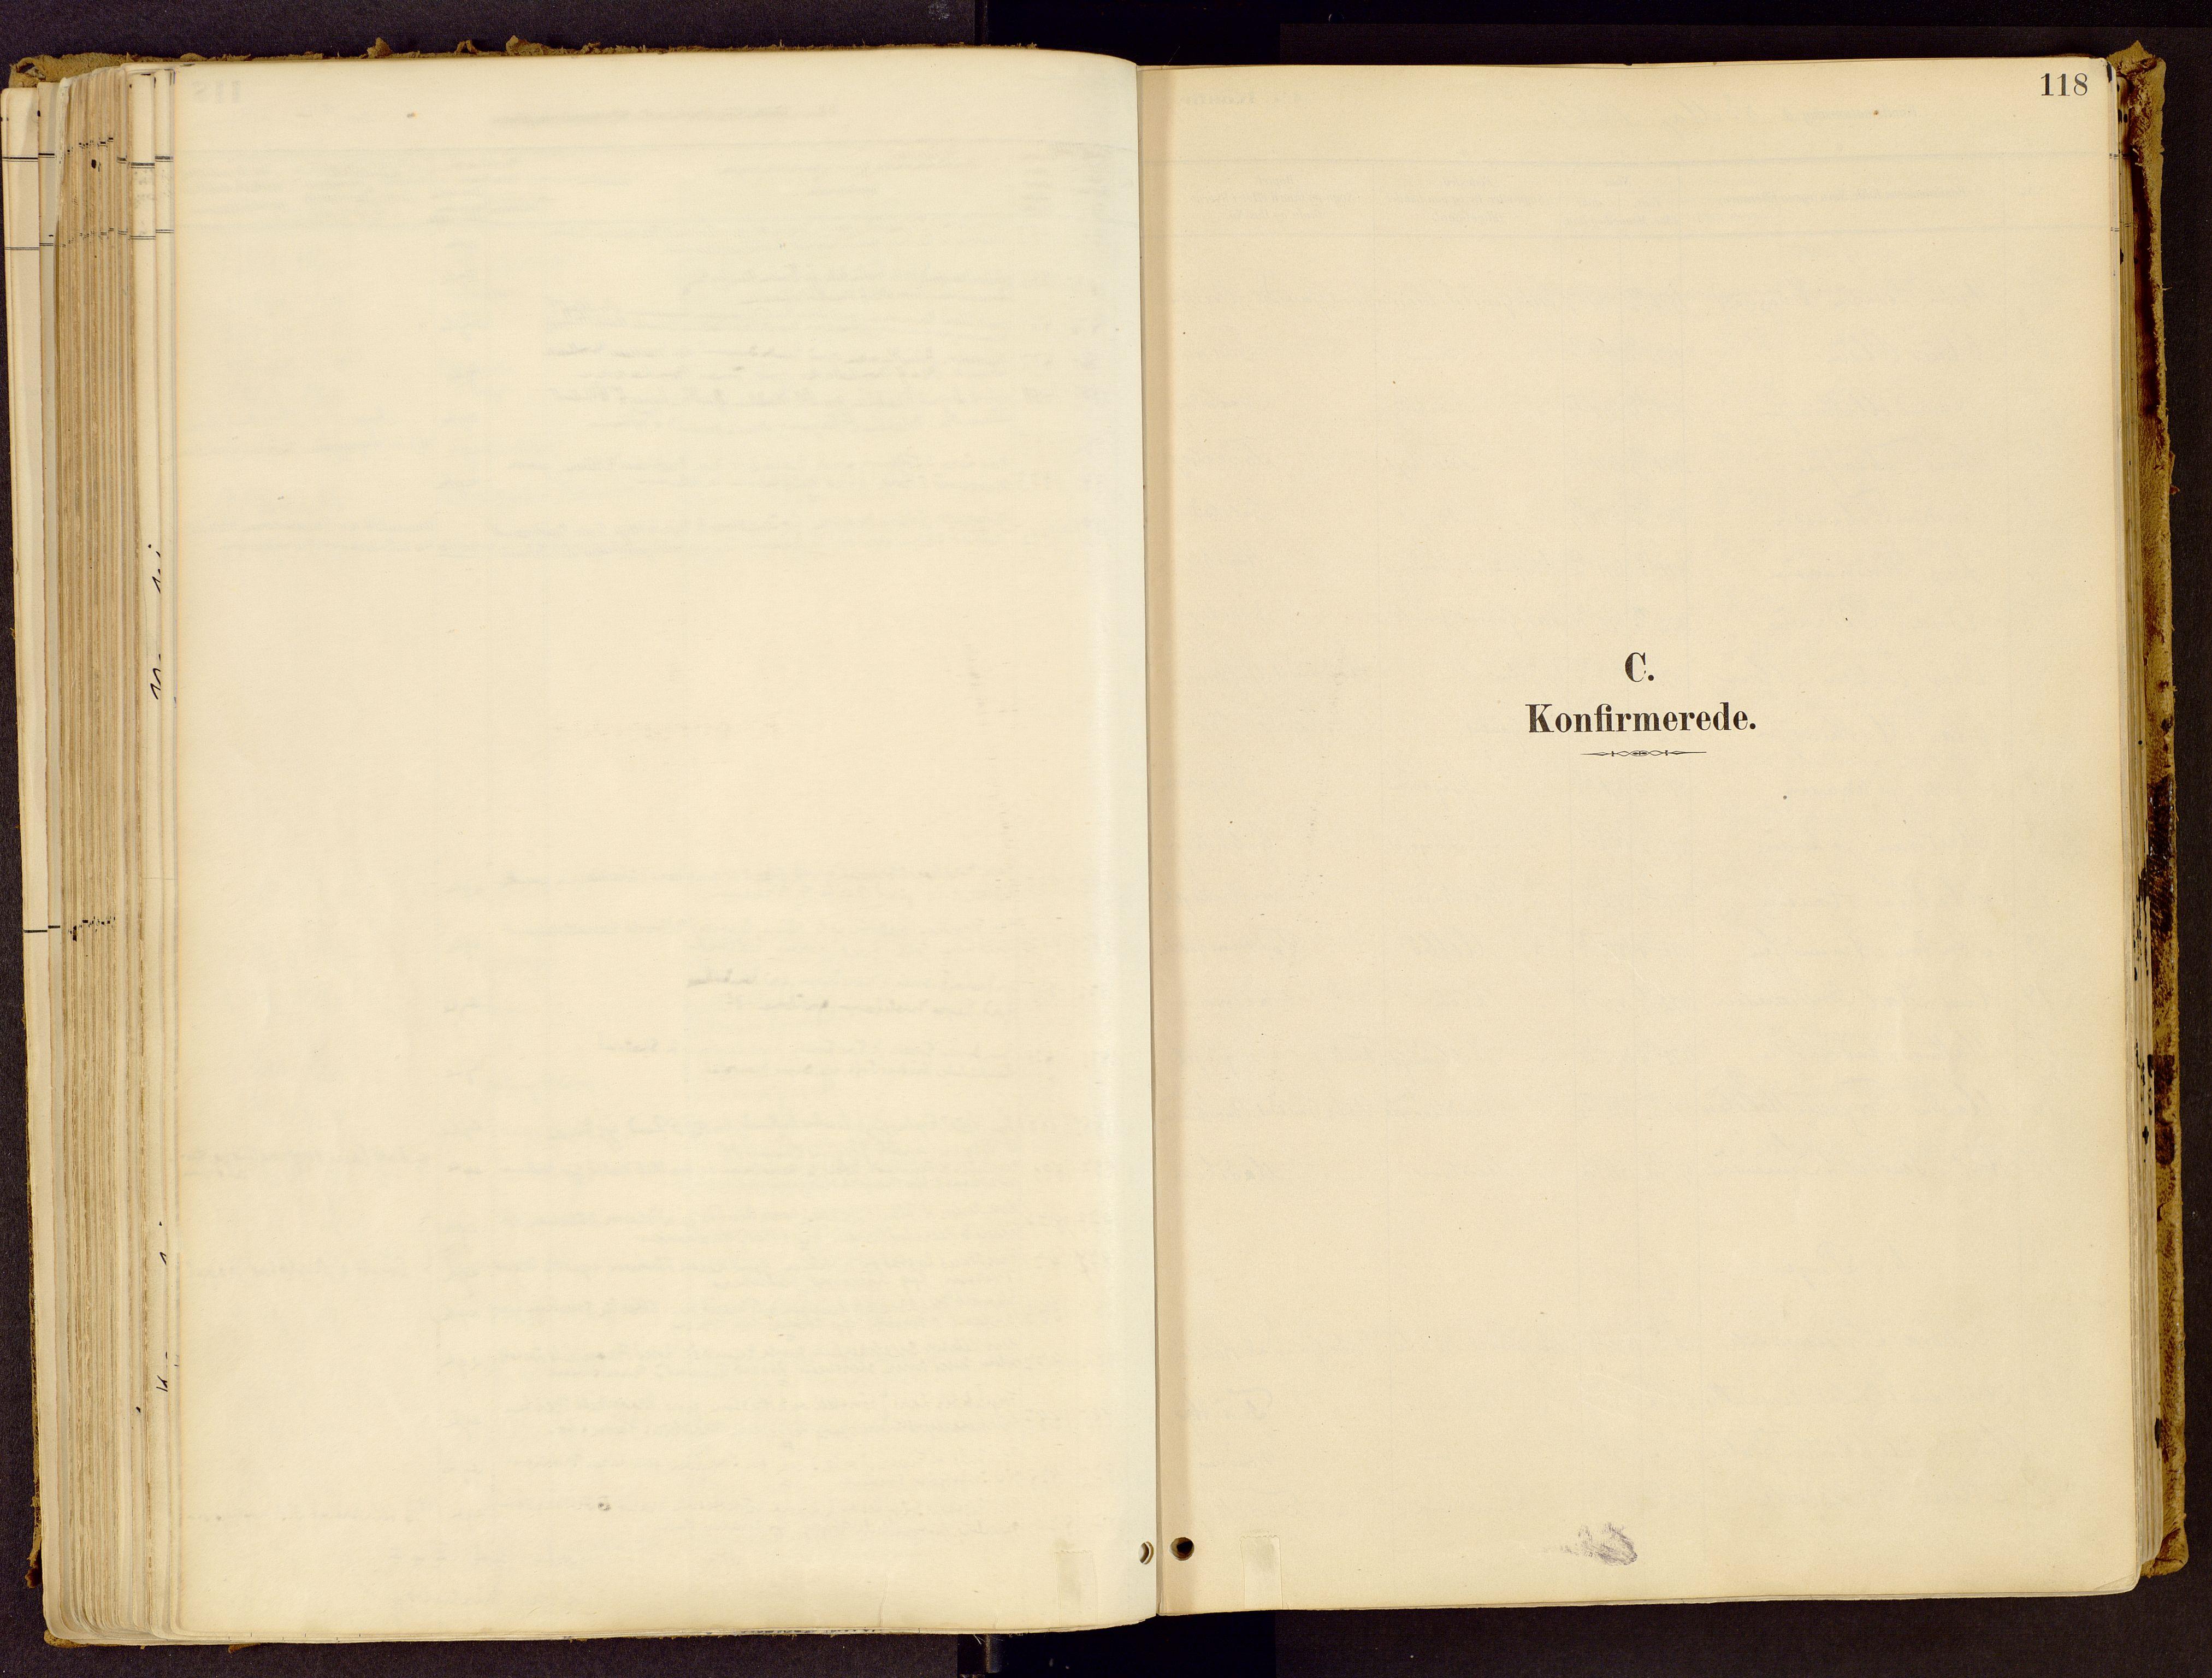 SAH, Vestre Gausdal prestekontor, Ministerialbok nr. 1, 1887-1914, s. 118